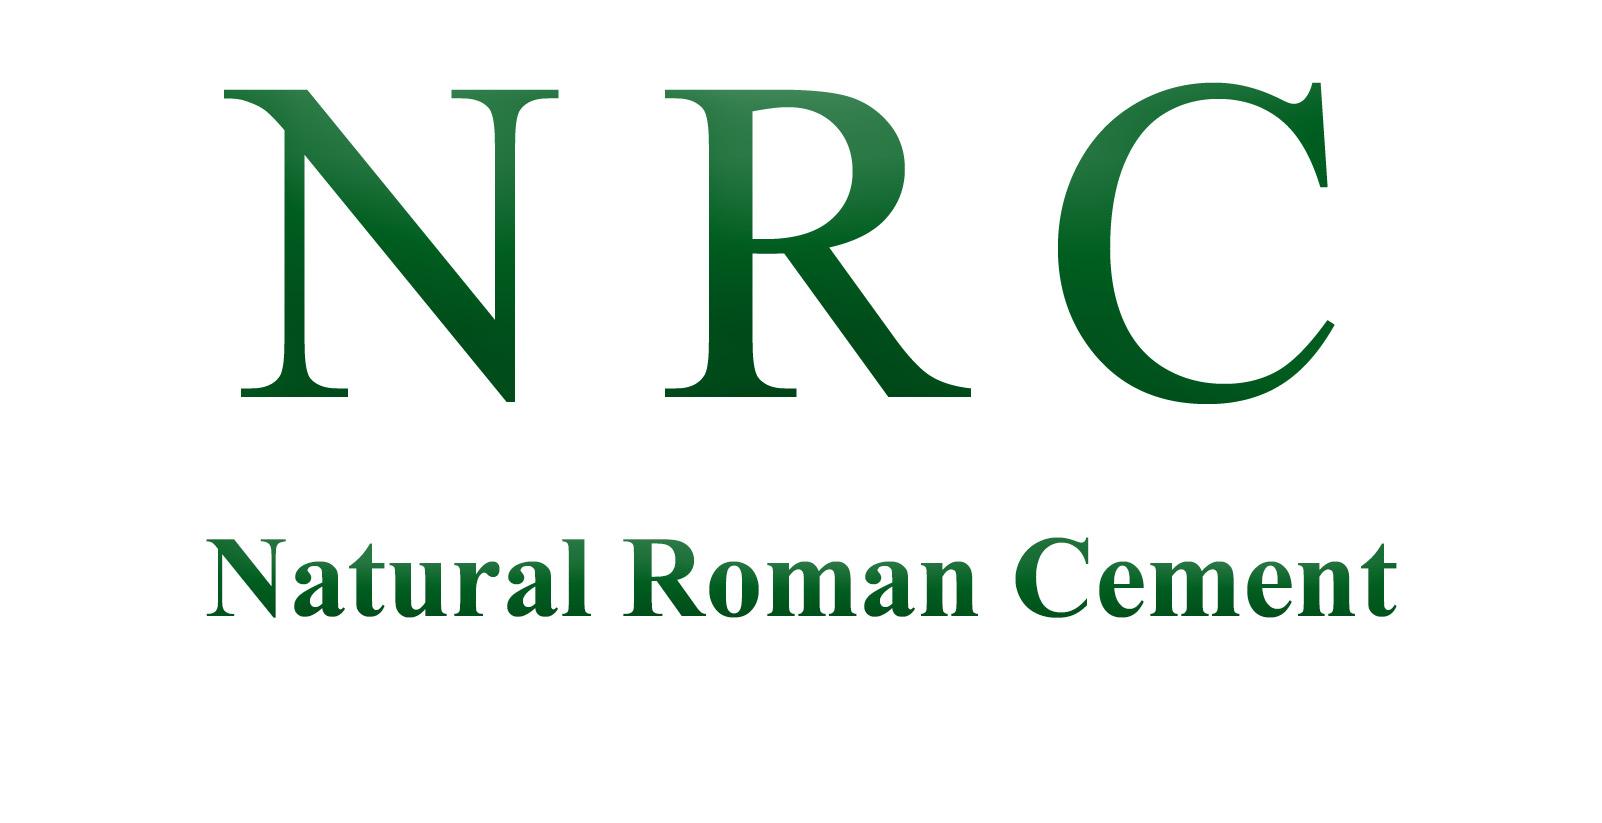 Natural Roman Cement